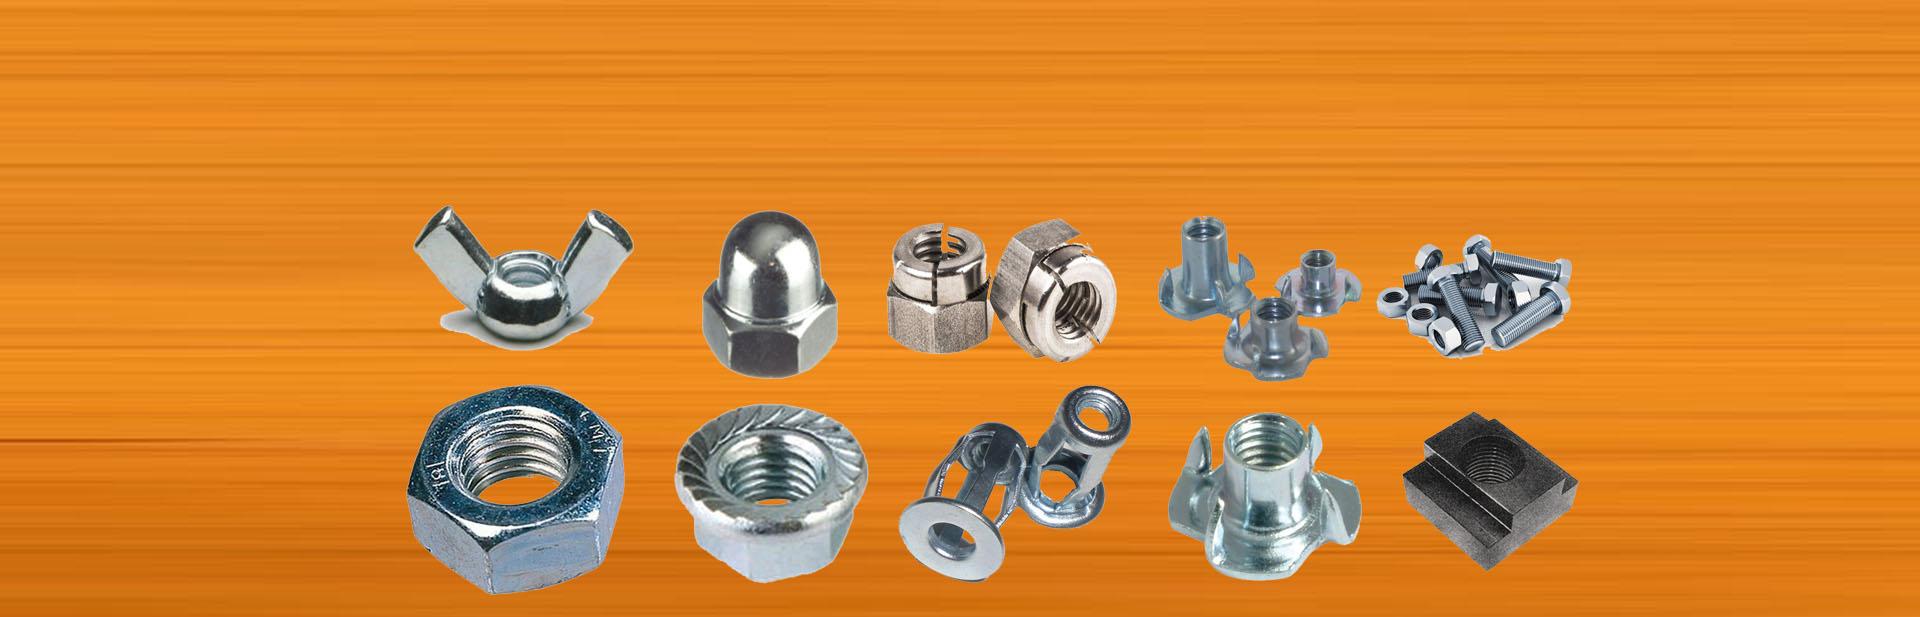 CancoFasteners International manufacturer of high quality